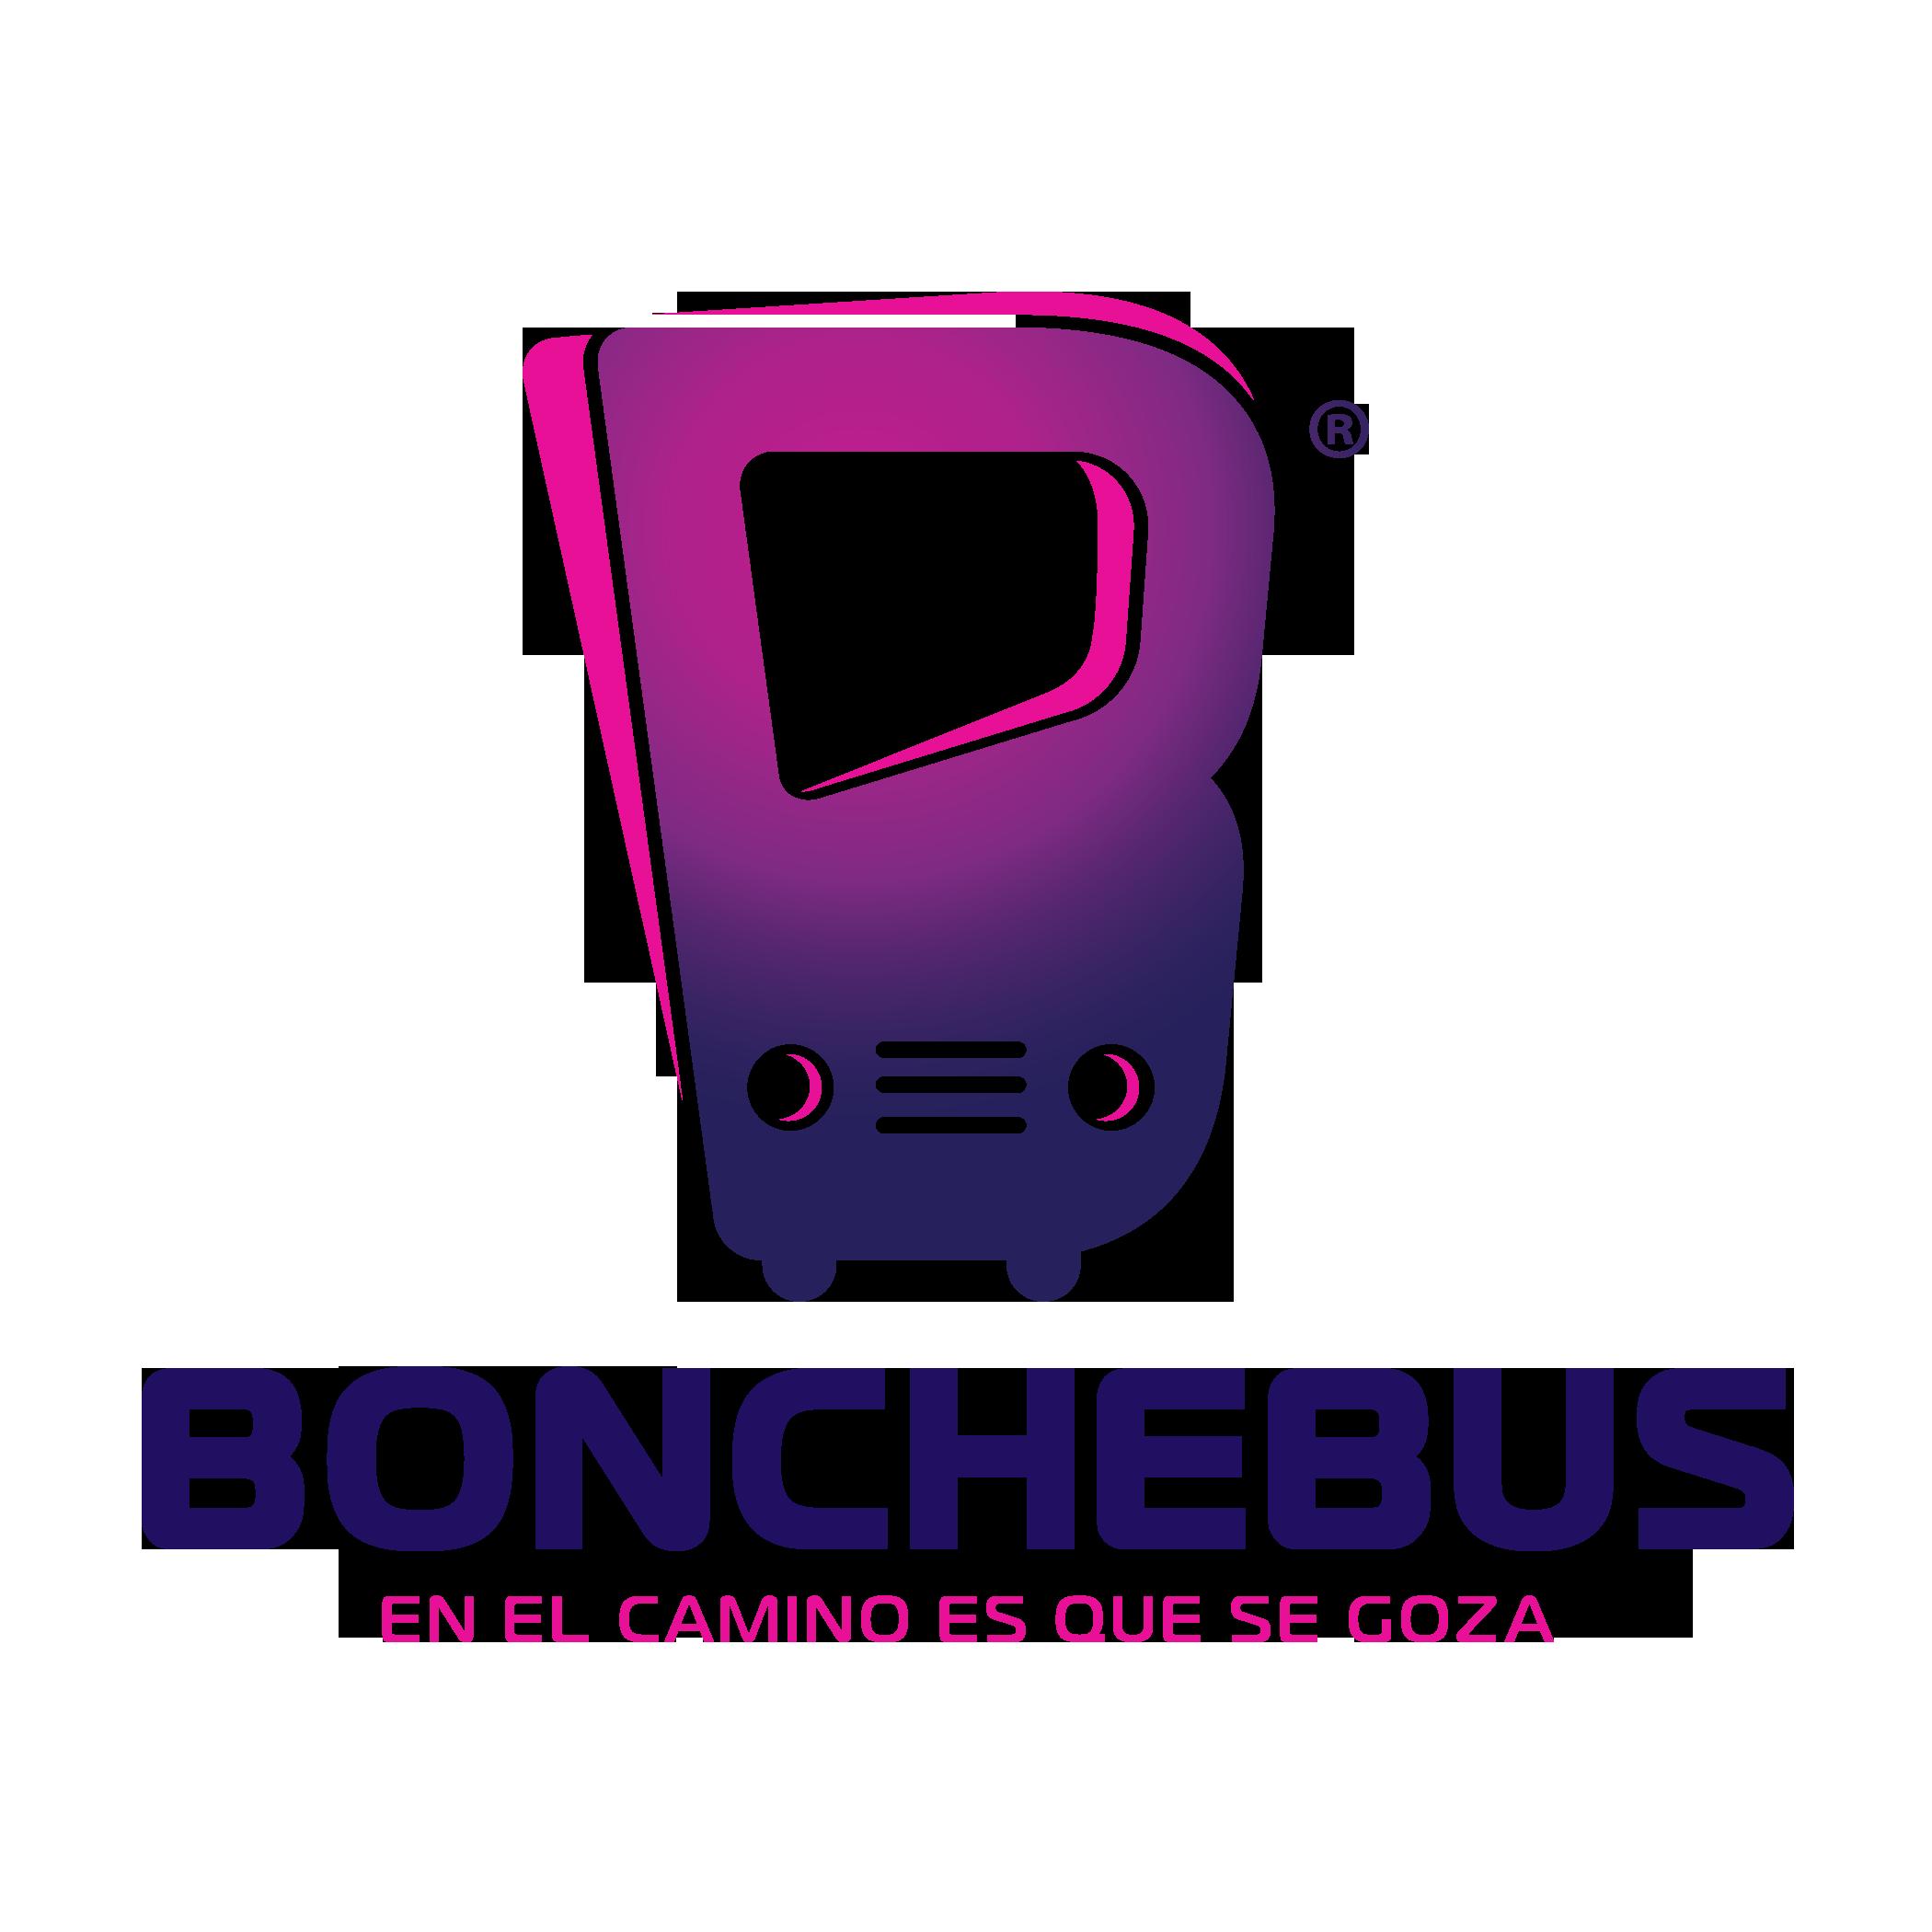 BONCHEBUS